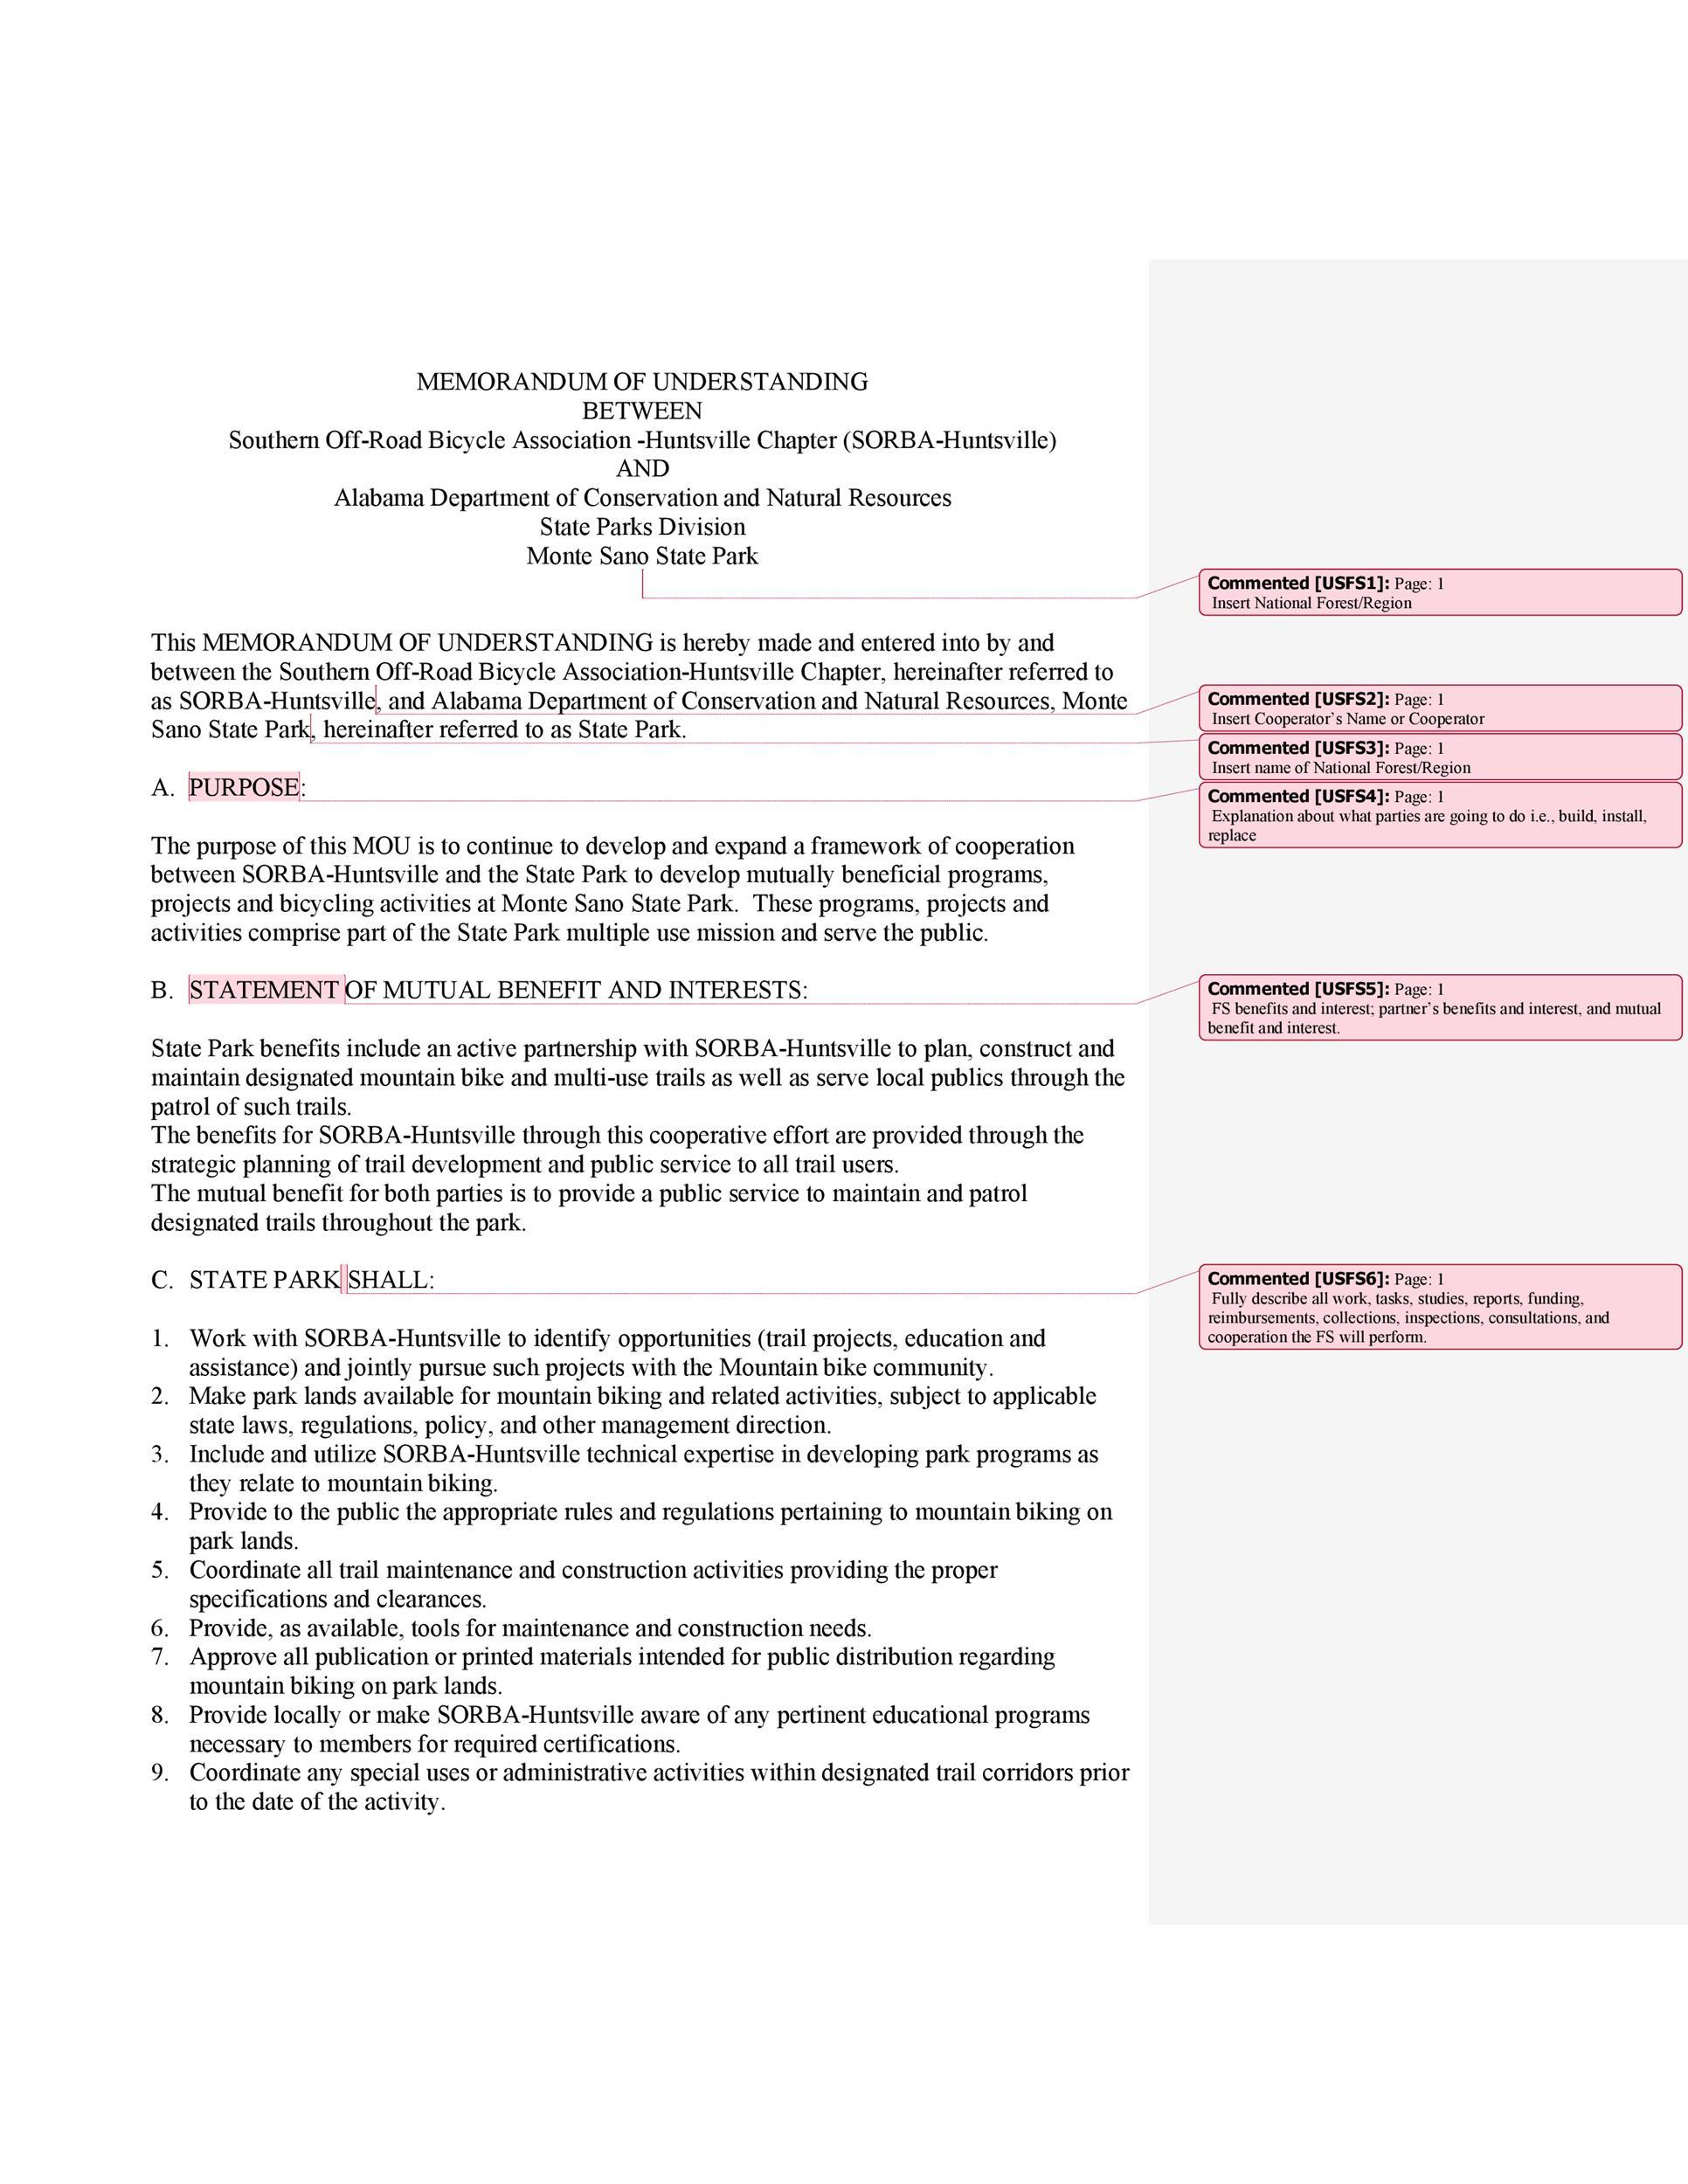 Free Memorandum of Understanding Template 40